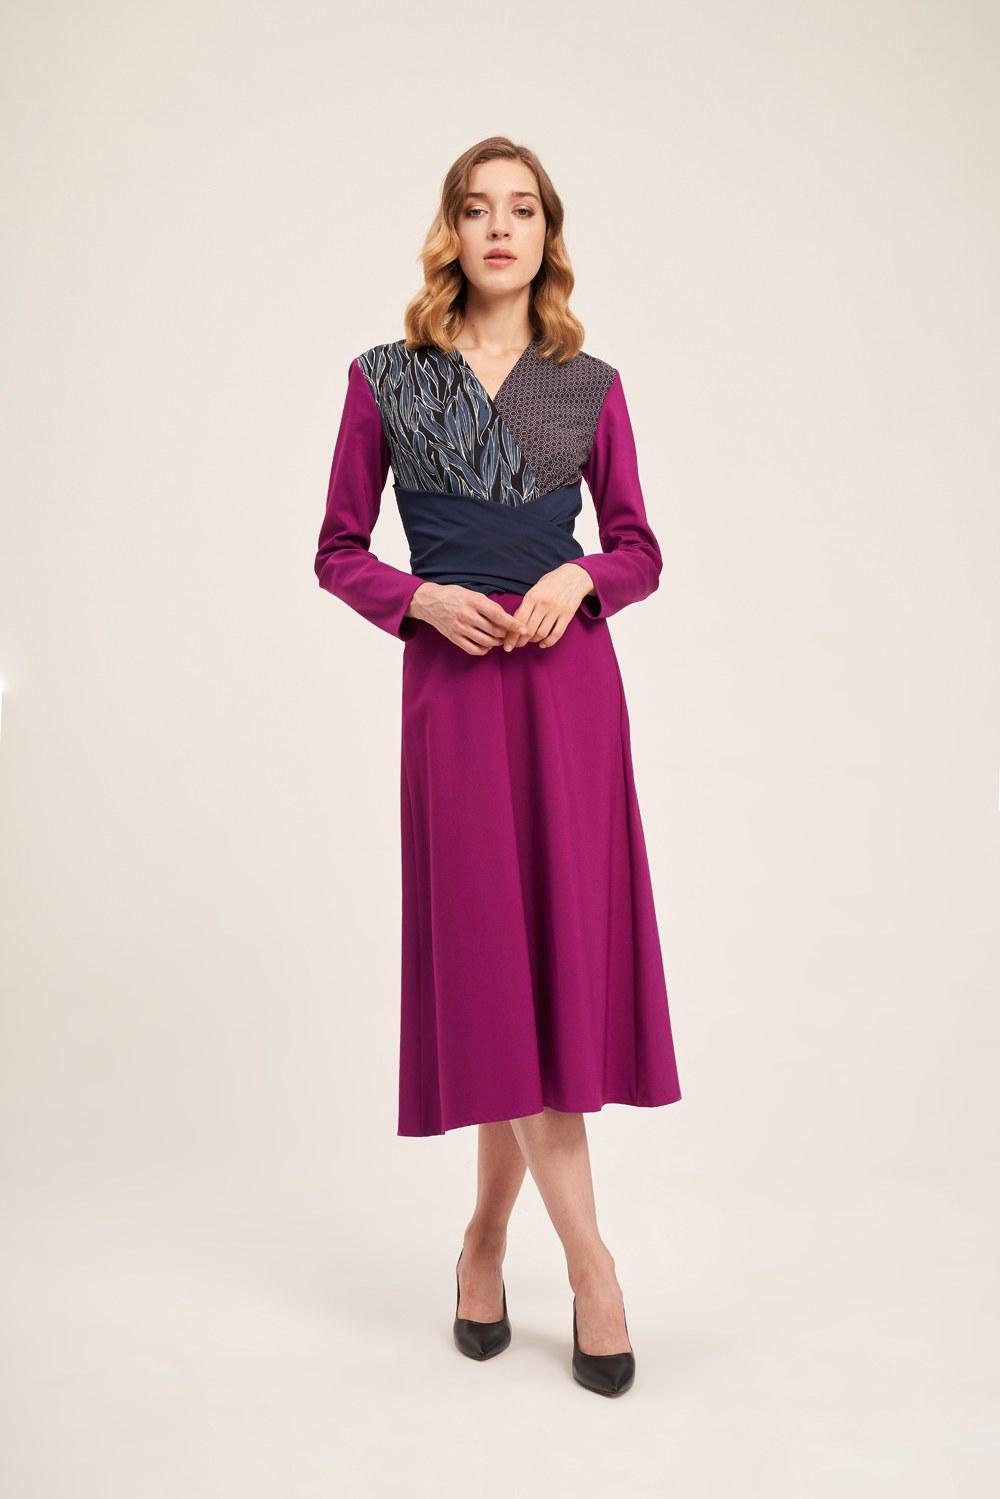 Parça Detaylı Mor Elbise